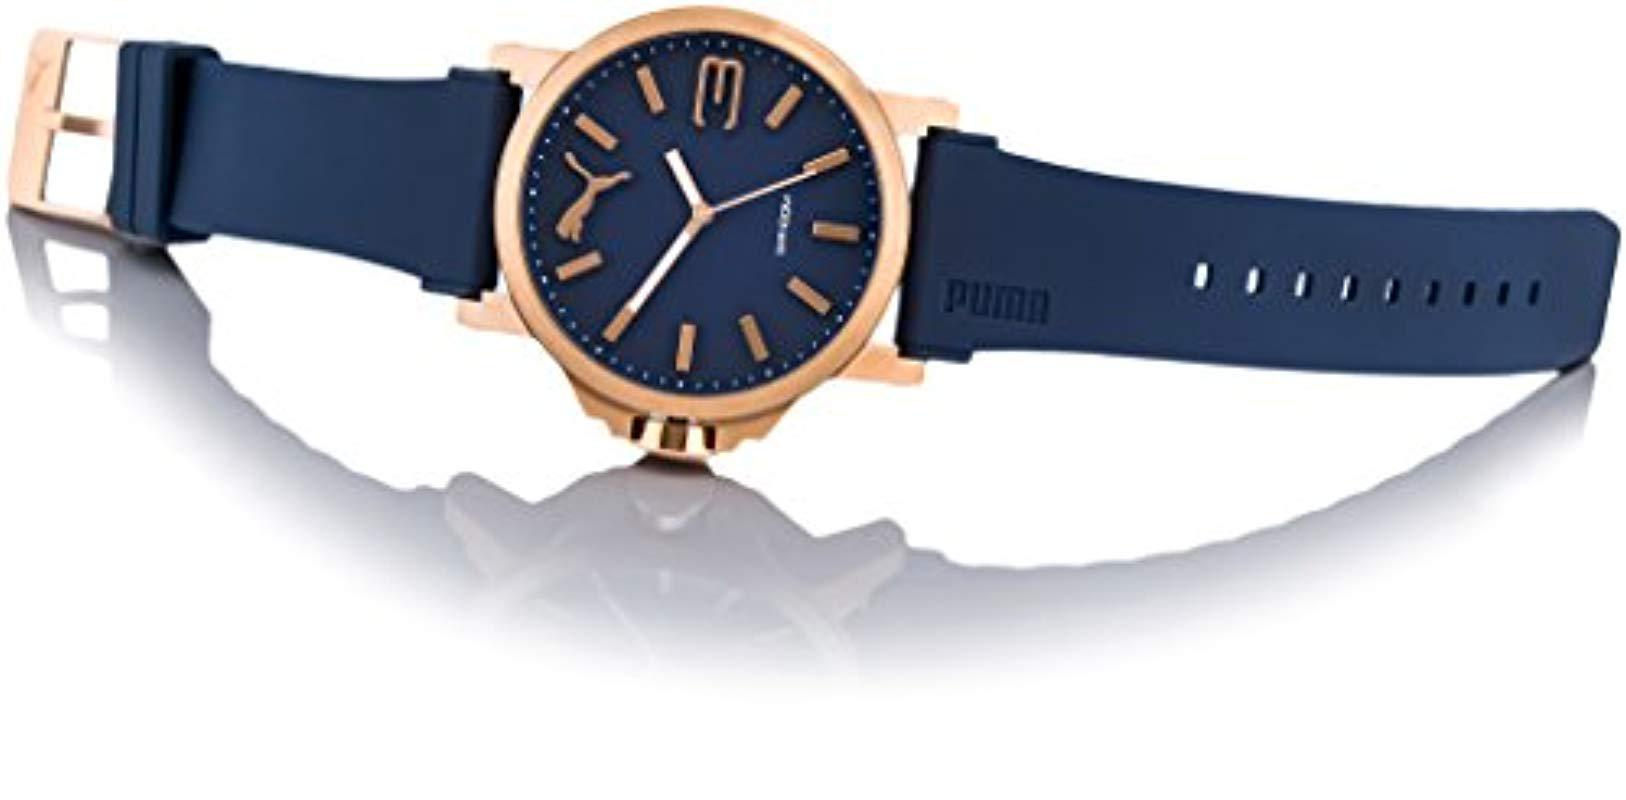 PUMA - Blue Reloj Analógico para Hombre de Cuarzo con Correa en Plástico  PU103461021 for Men. Ver en pantalla completa a60a951a4c4f